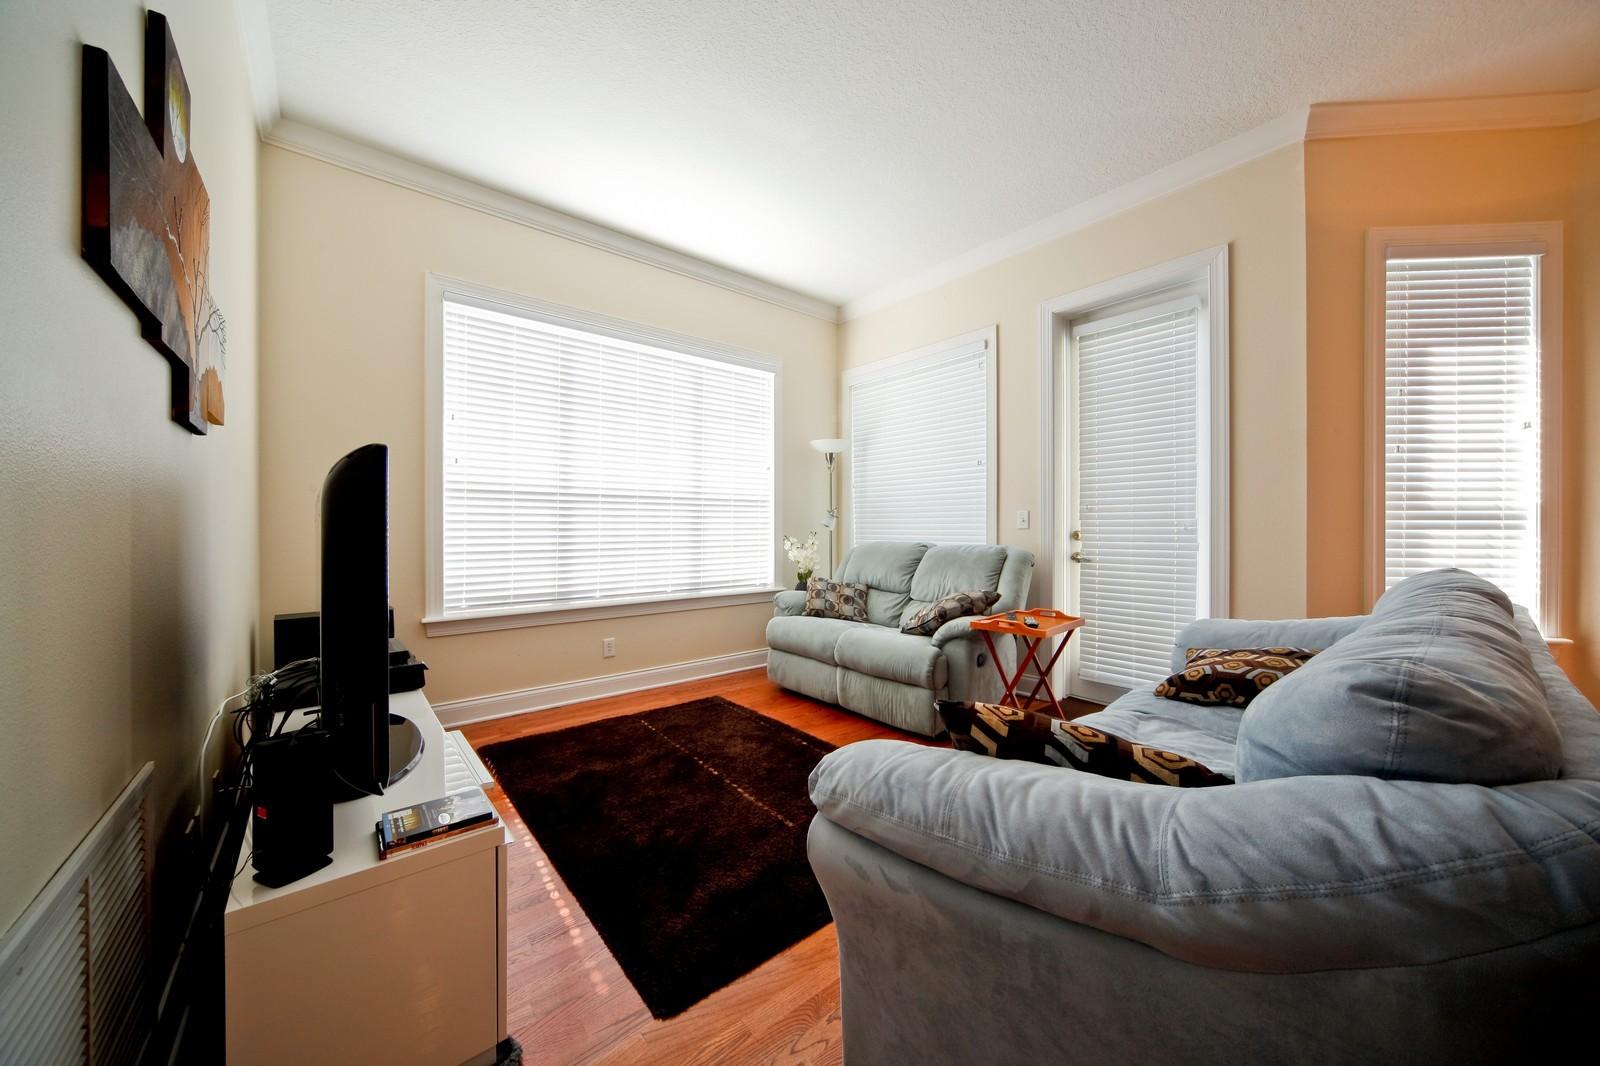 Real Estate Photography - 3812 El Prado Blvd, Tampa, FL, 33629 - Family Room